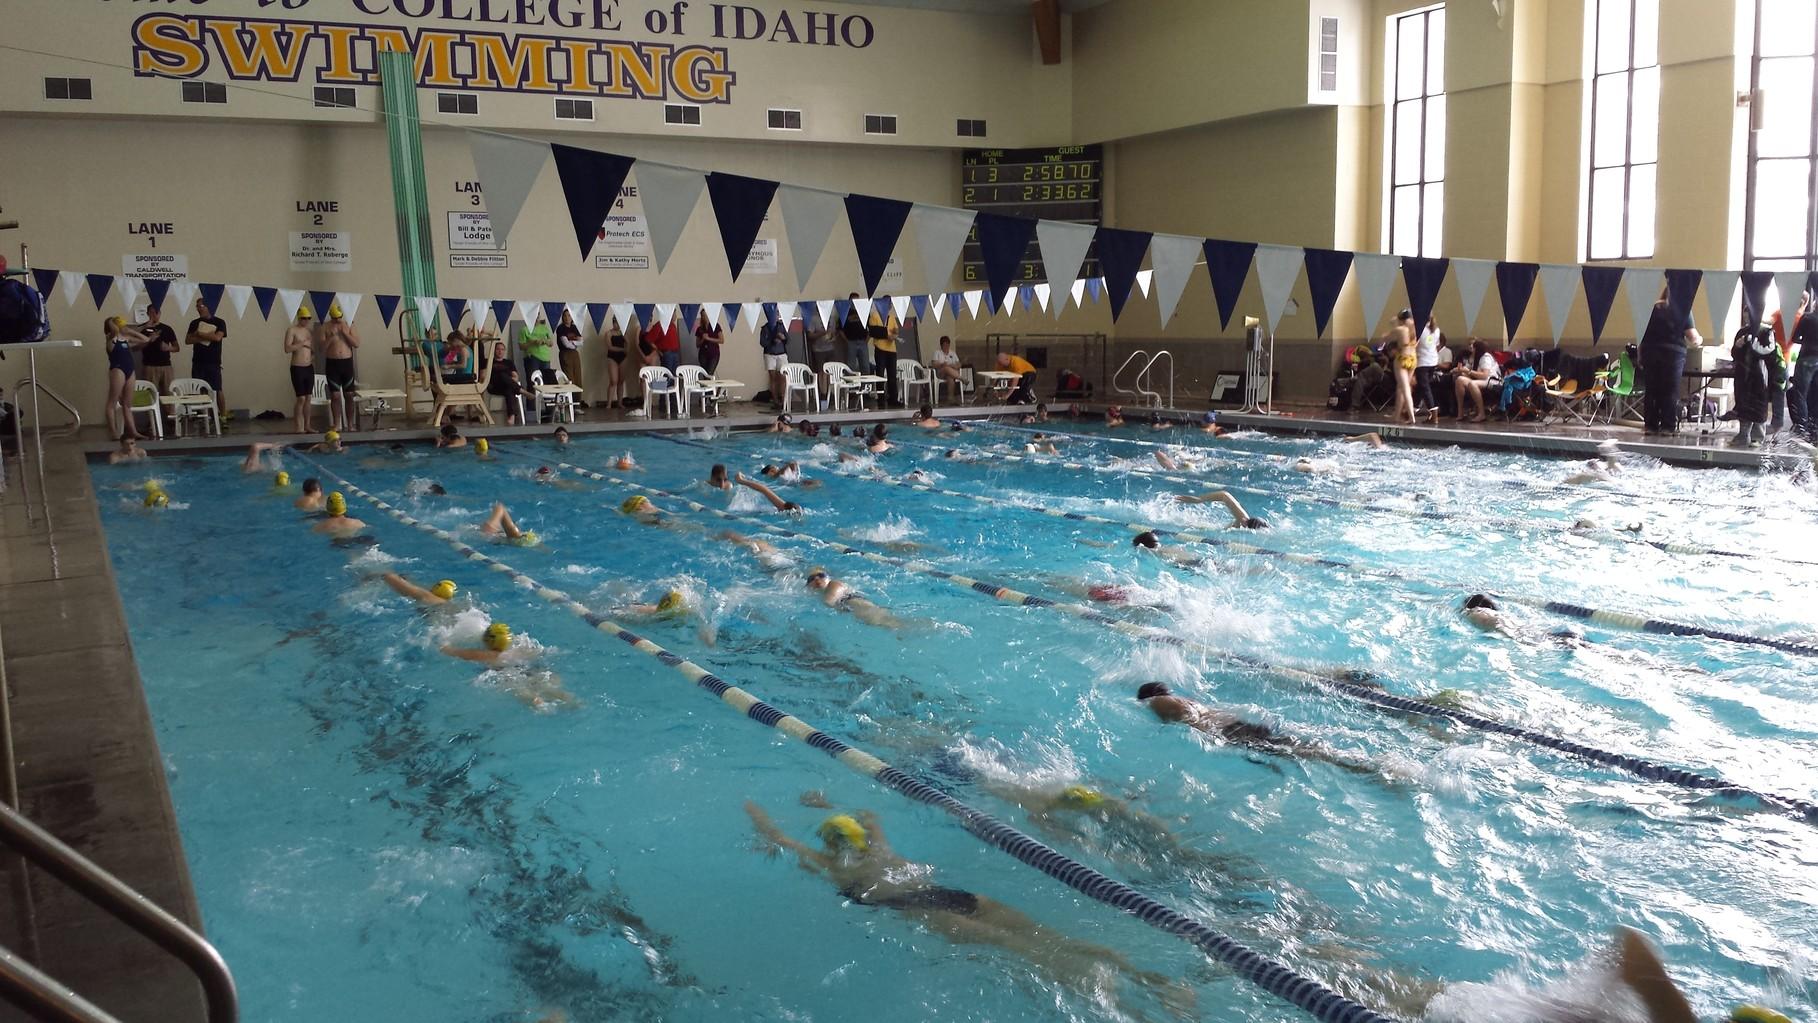 Warm ups at the swim meet at College of Idaho February 8-9.